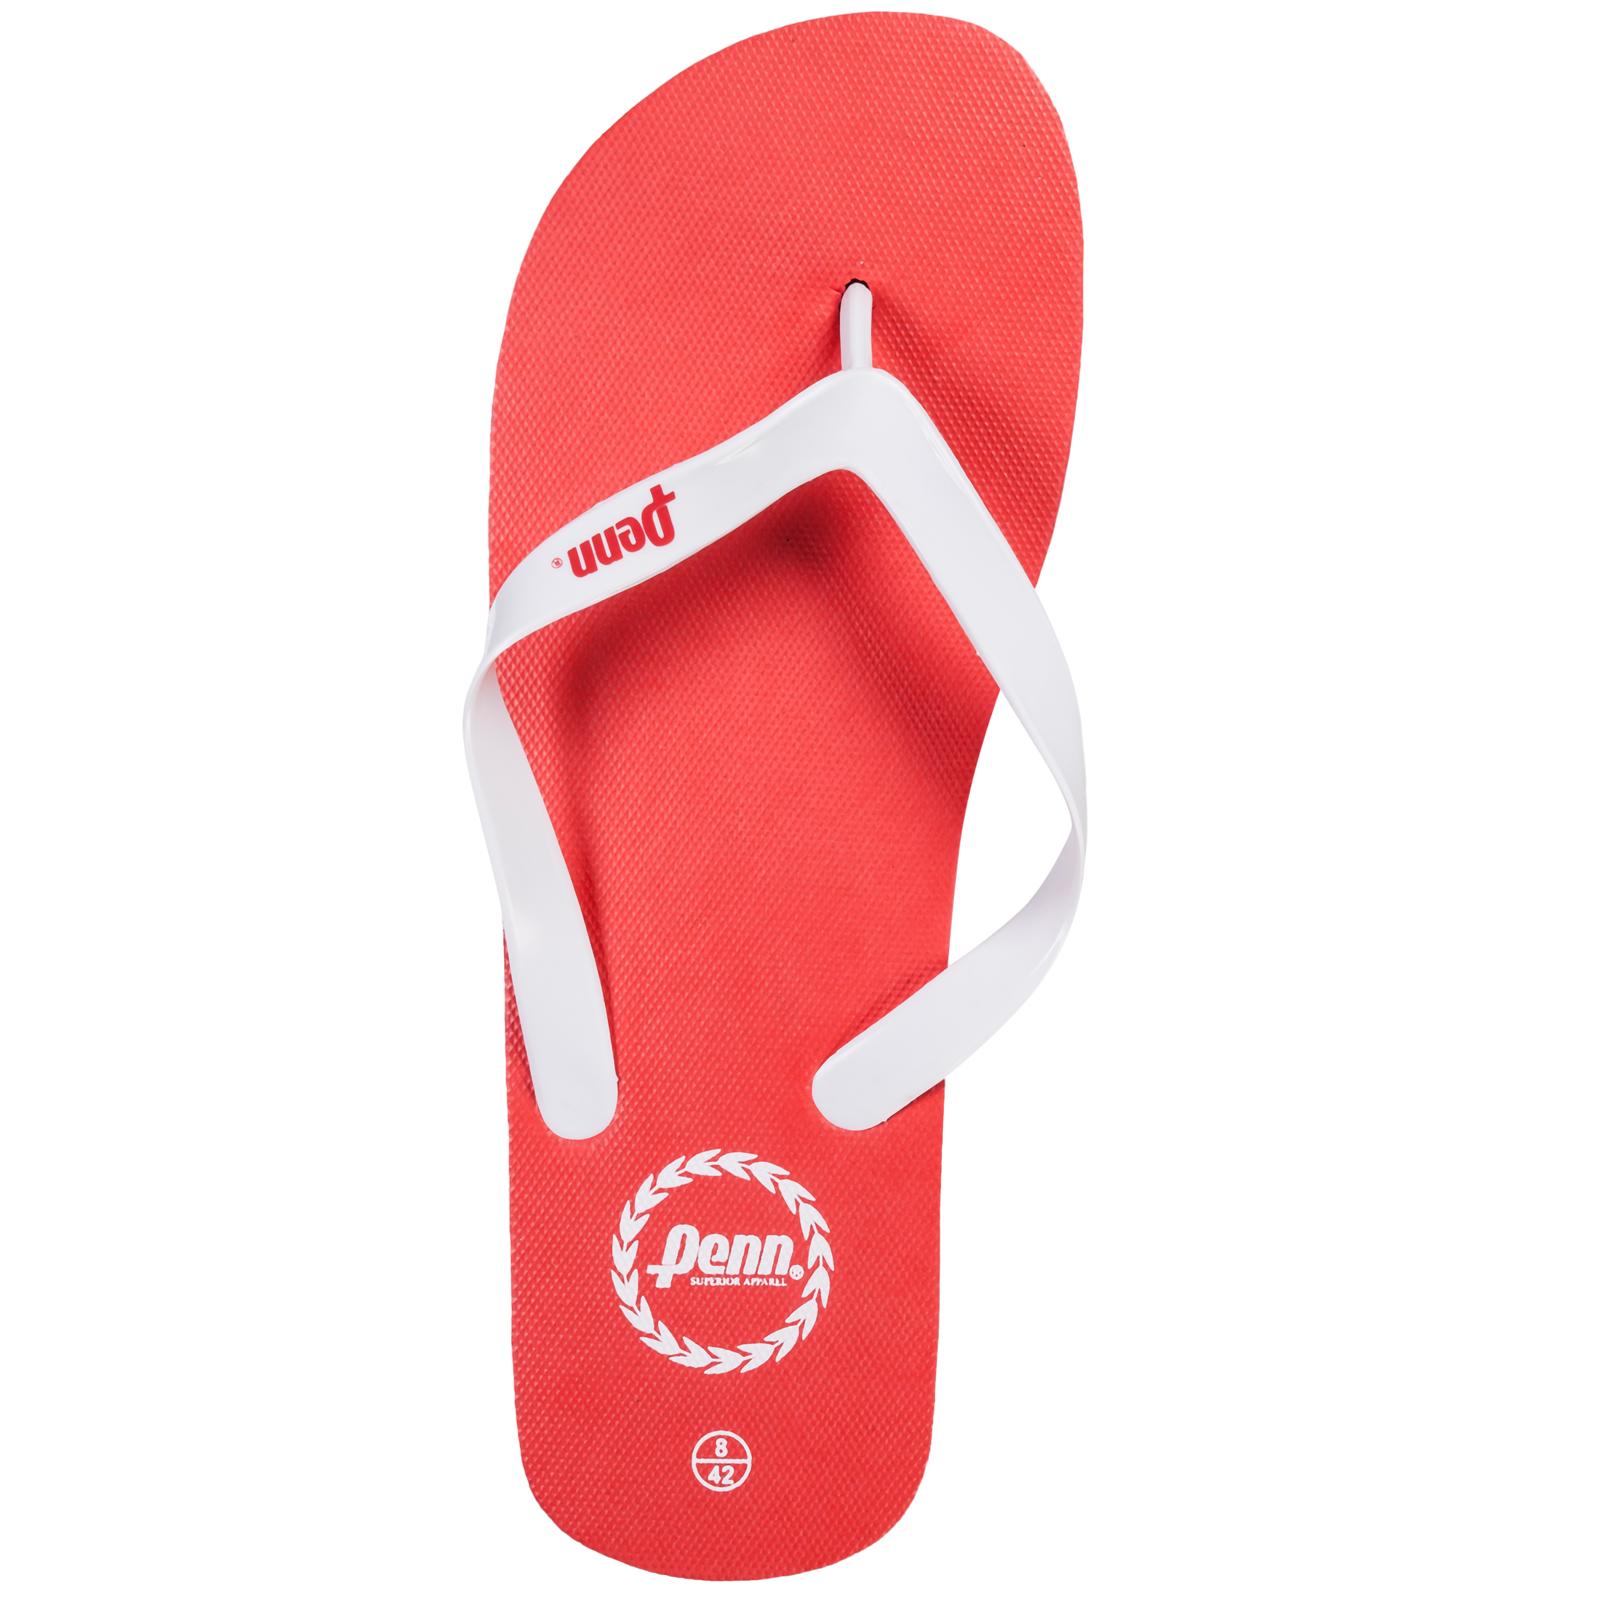 Penn Unisex Sandalias Ojotas de diapositivas de vacaciones de verano Playa Tangas Zapatos